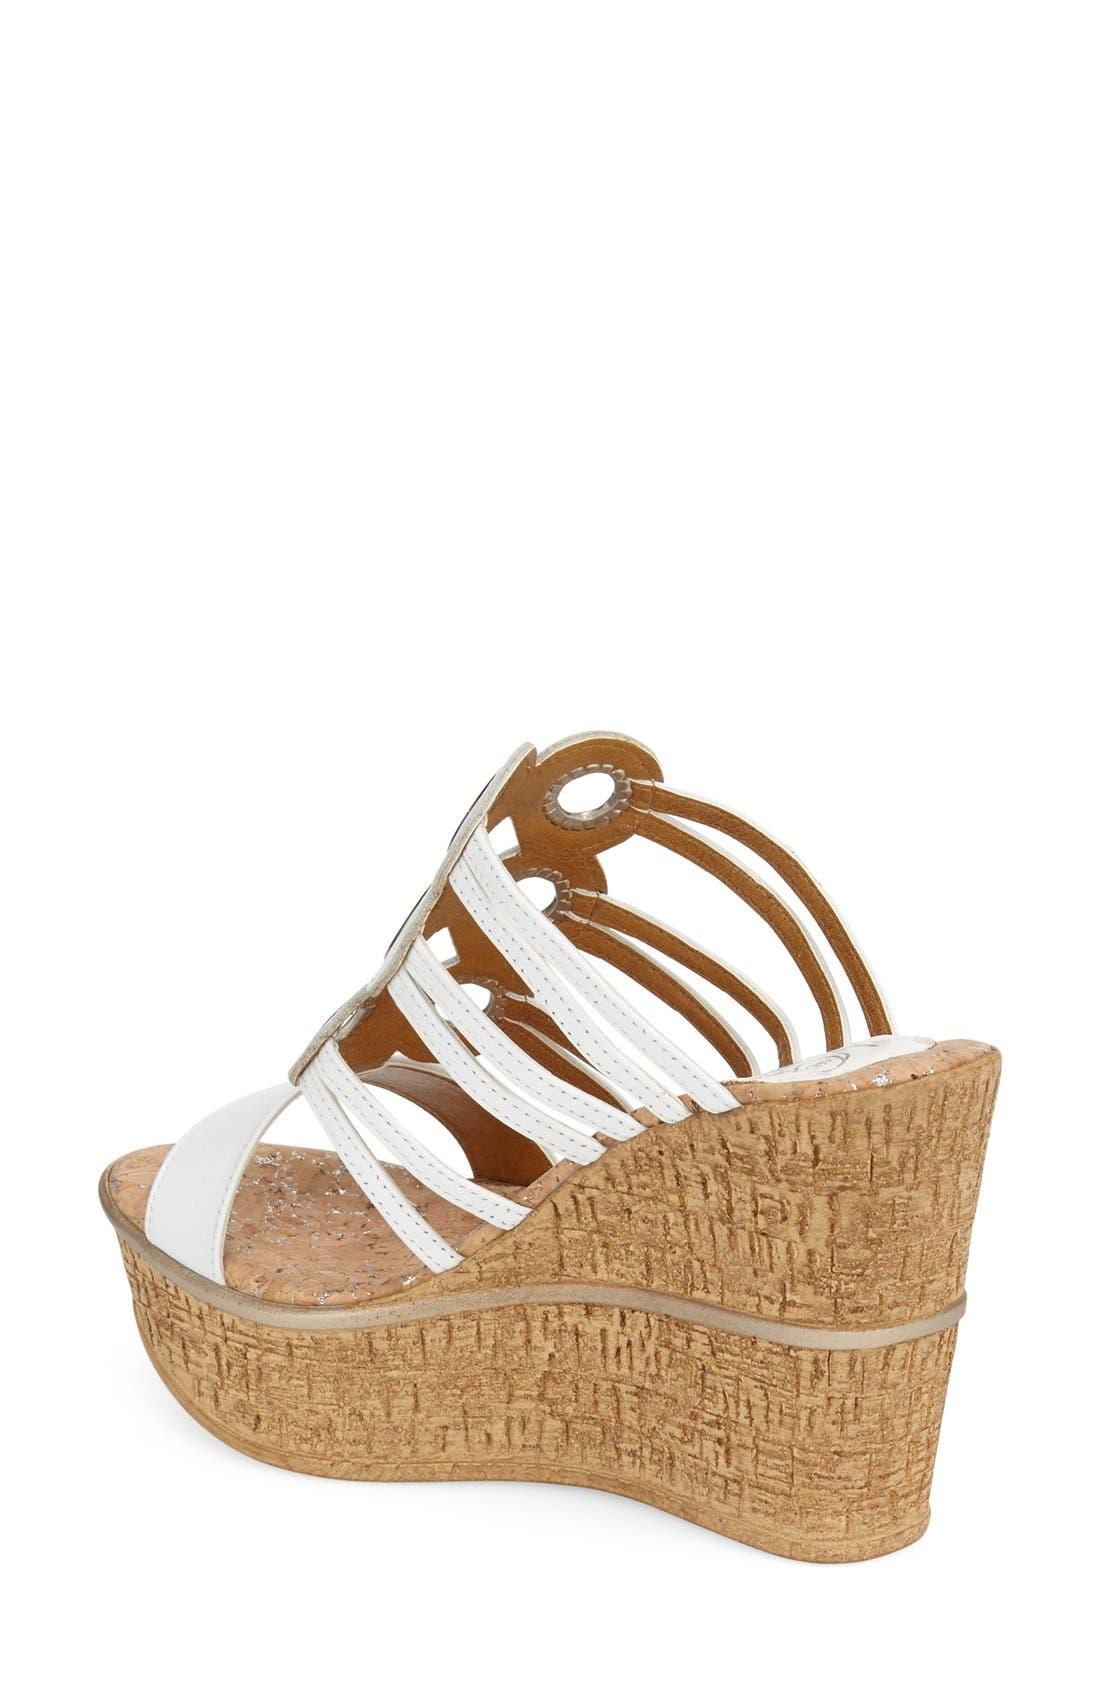 'Elise' Wedge Sandal,                             Alternate thumbnail 2, color,                             White Leather